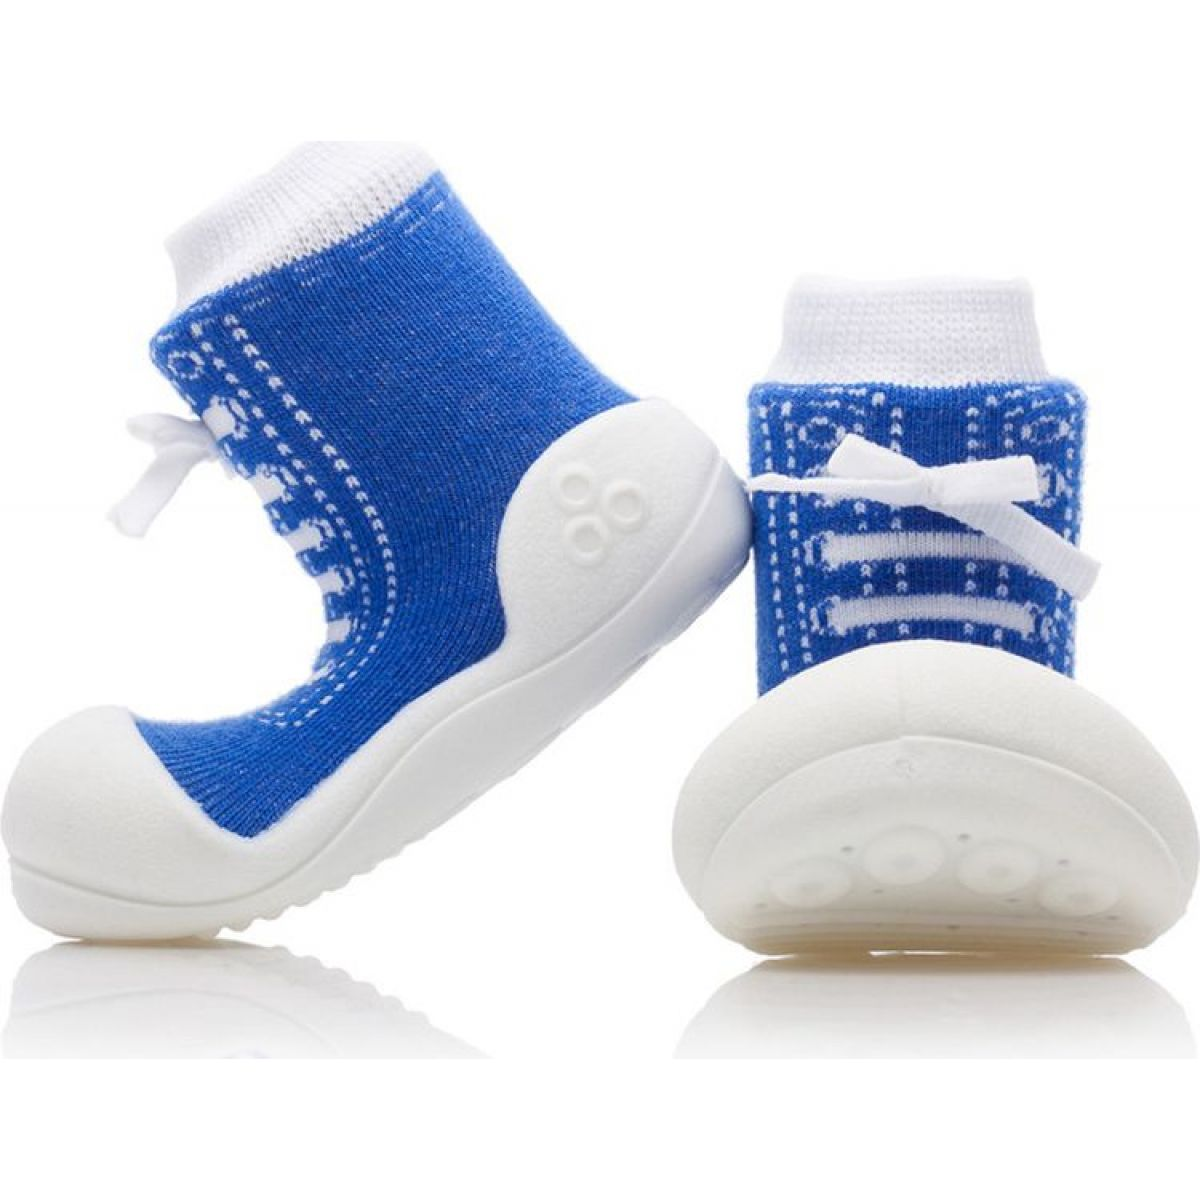 Attipas Sneakers Blue - Euro 22,5